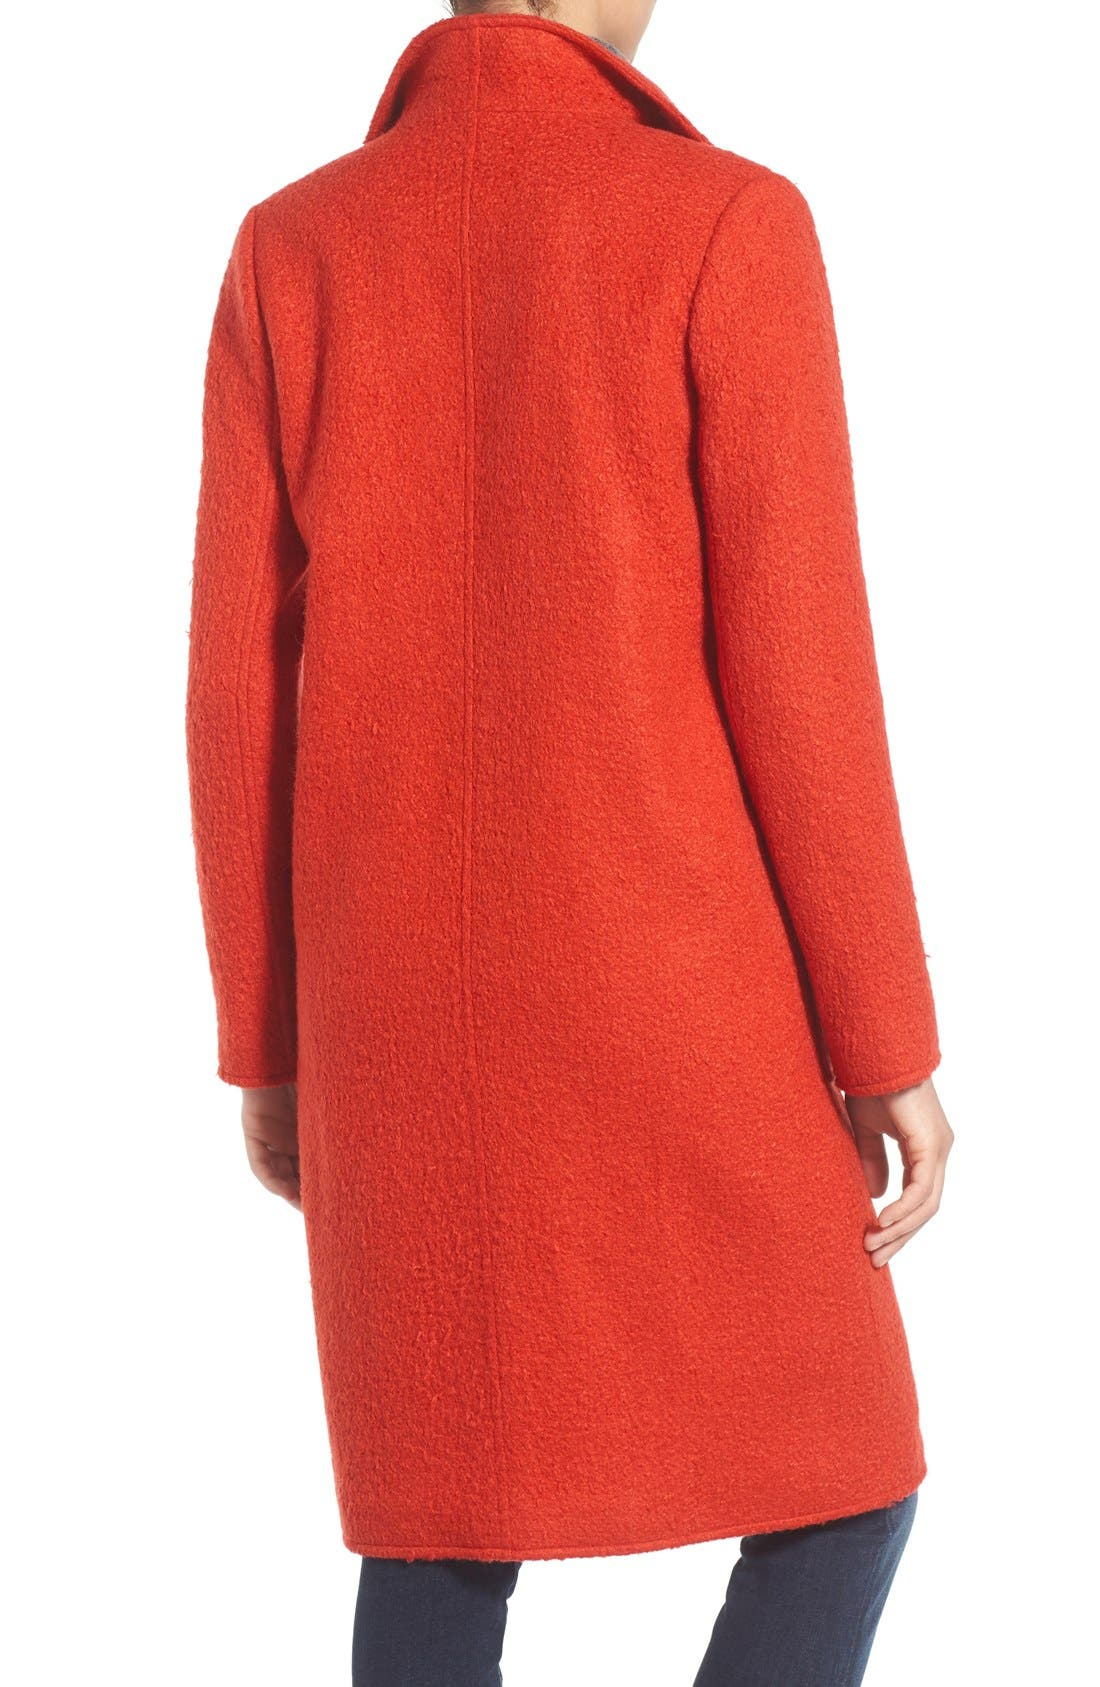 BERNARDO, Textured Long Coat, Alternate thumbnail 2, color, 852